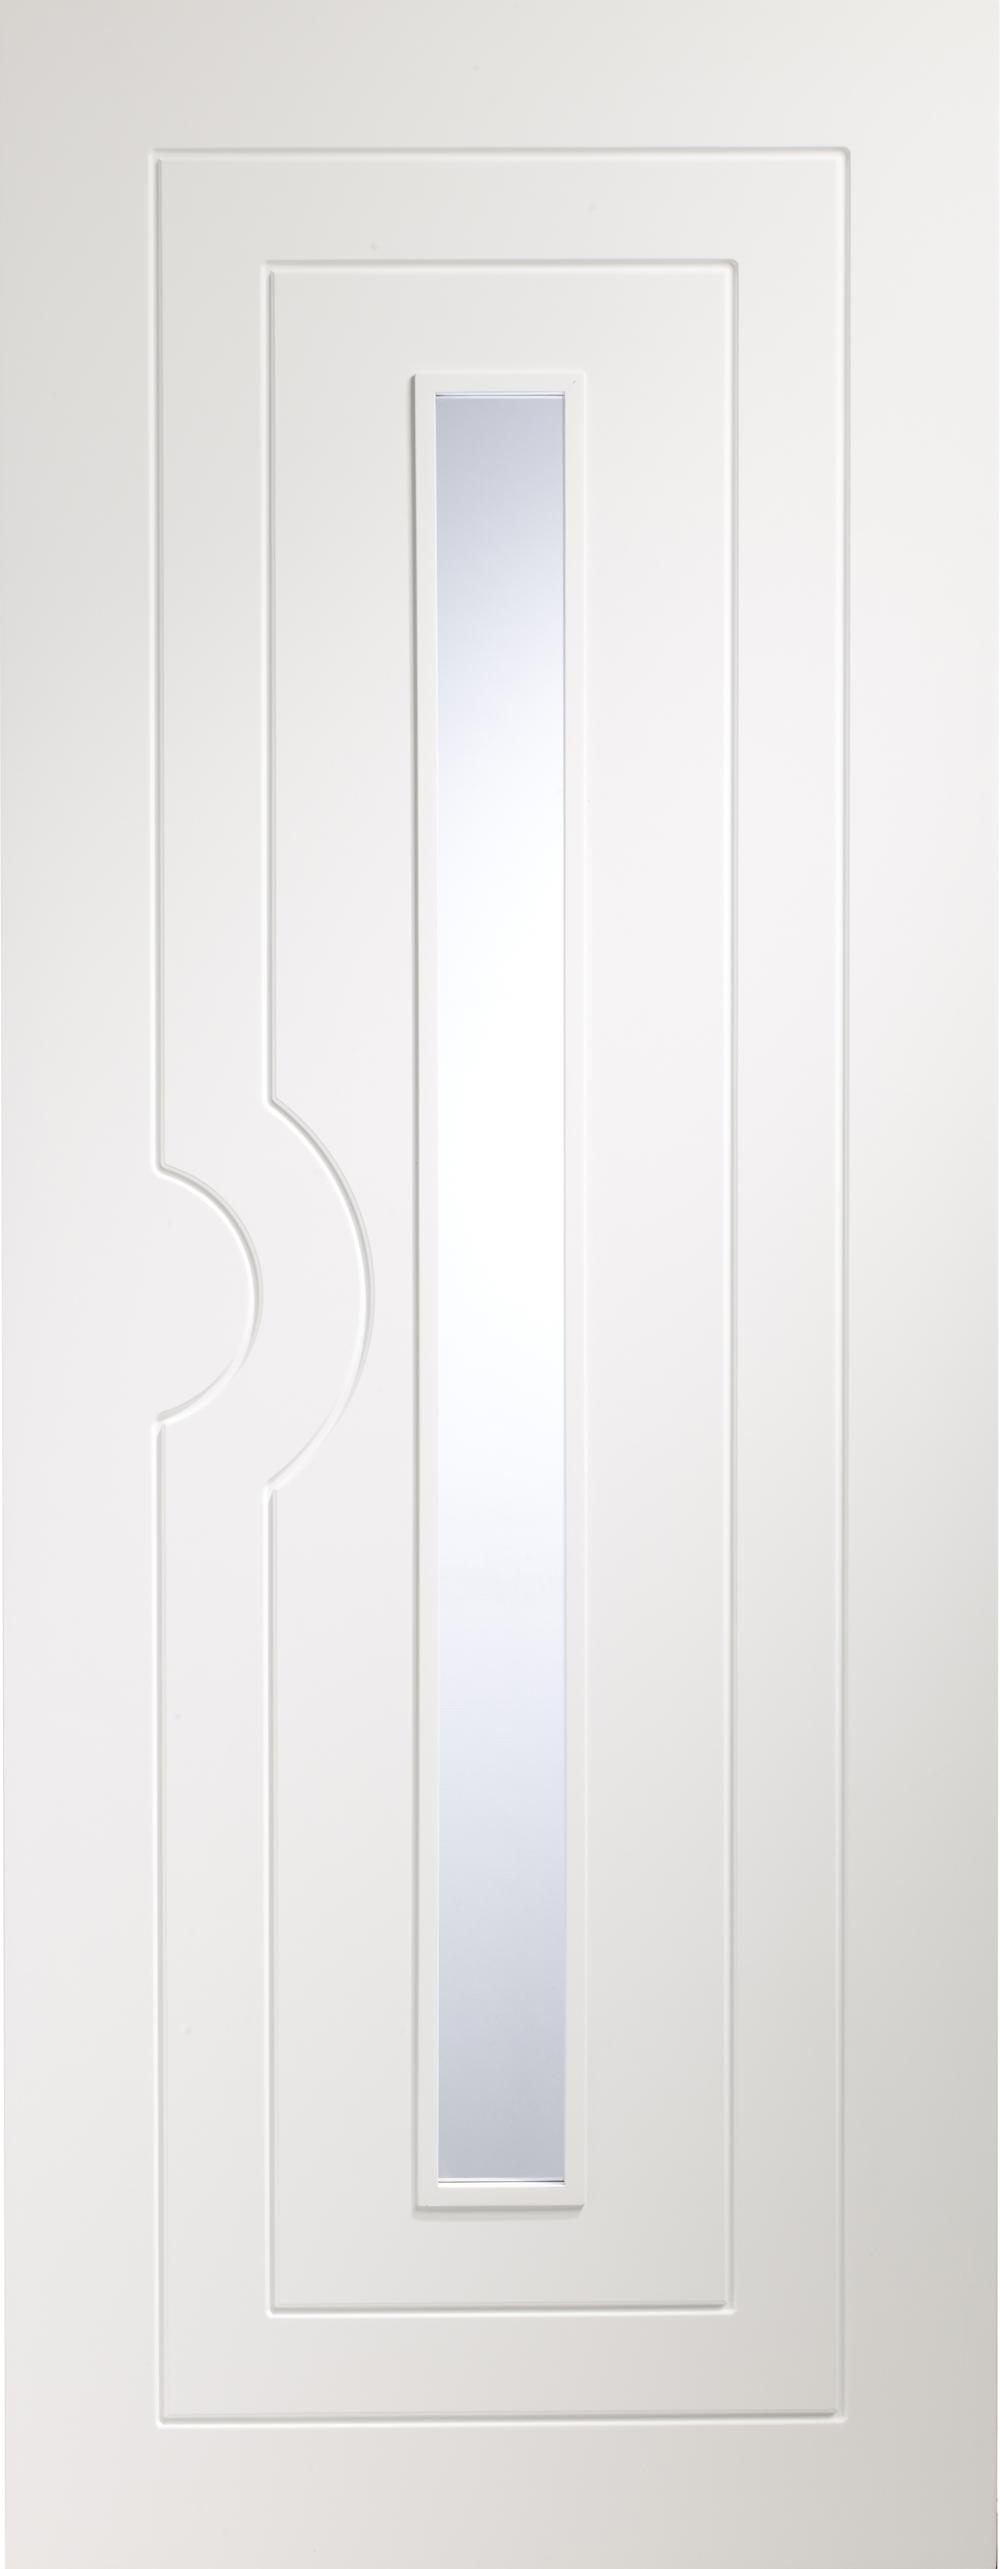 Potenza White Glazed Door - PREFINISHED